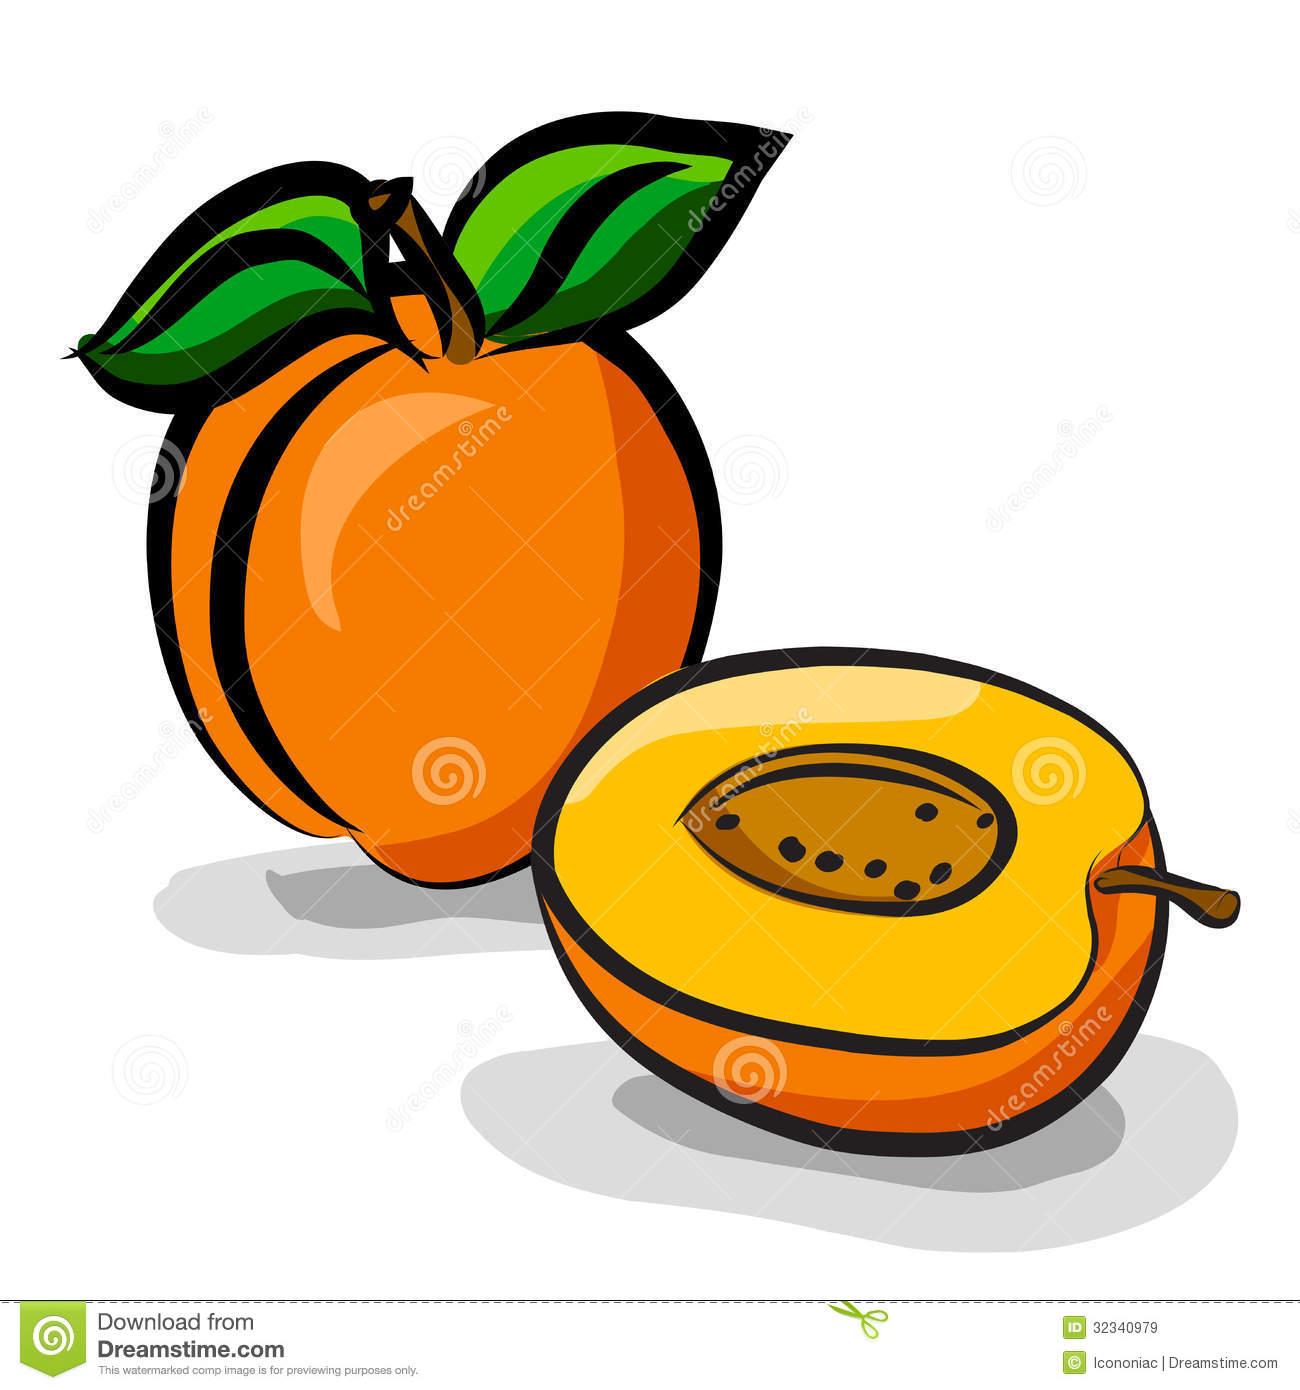 Apricot Bars Clipart #1-Apricot Bars Clipart #1-8